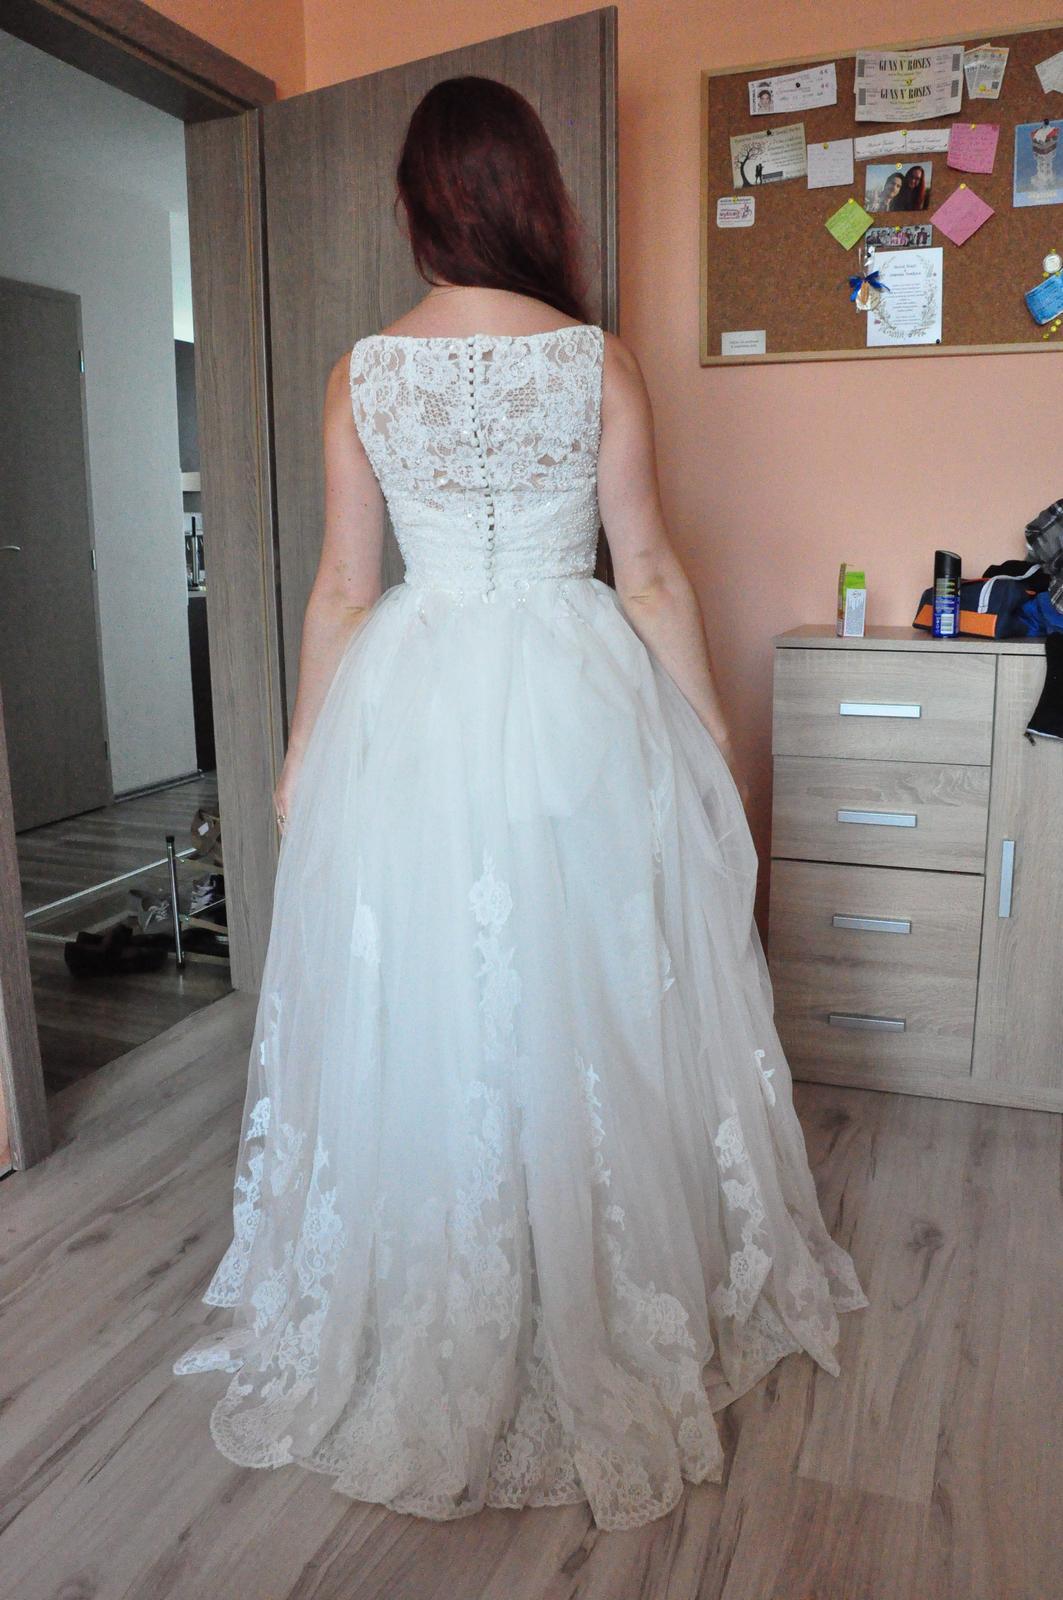 Svadobné šaty Maggie Sottero Willow - Obrázok č. 2